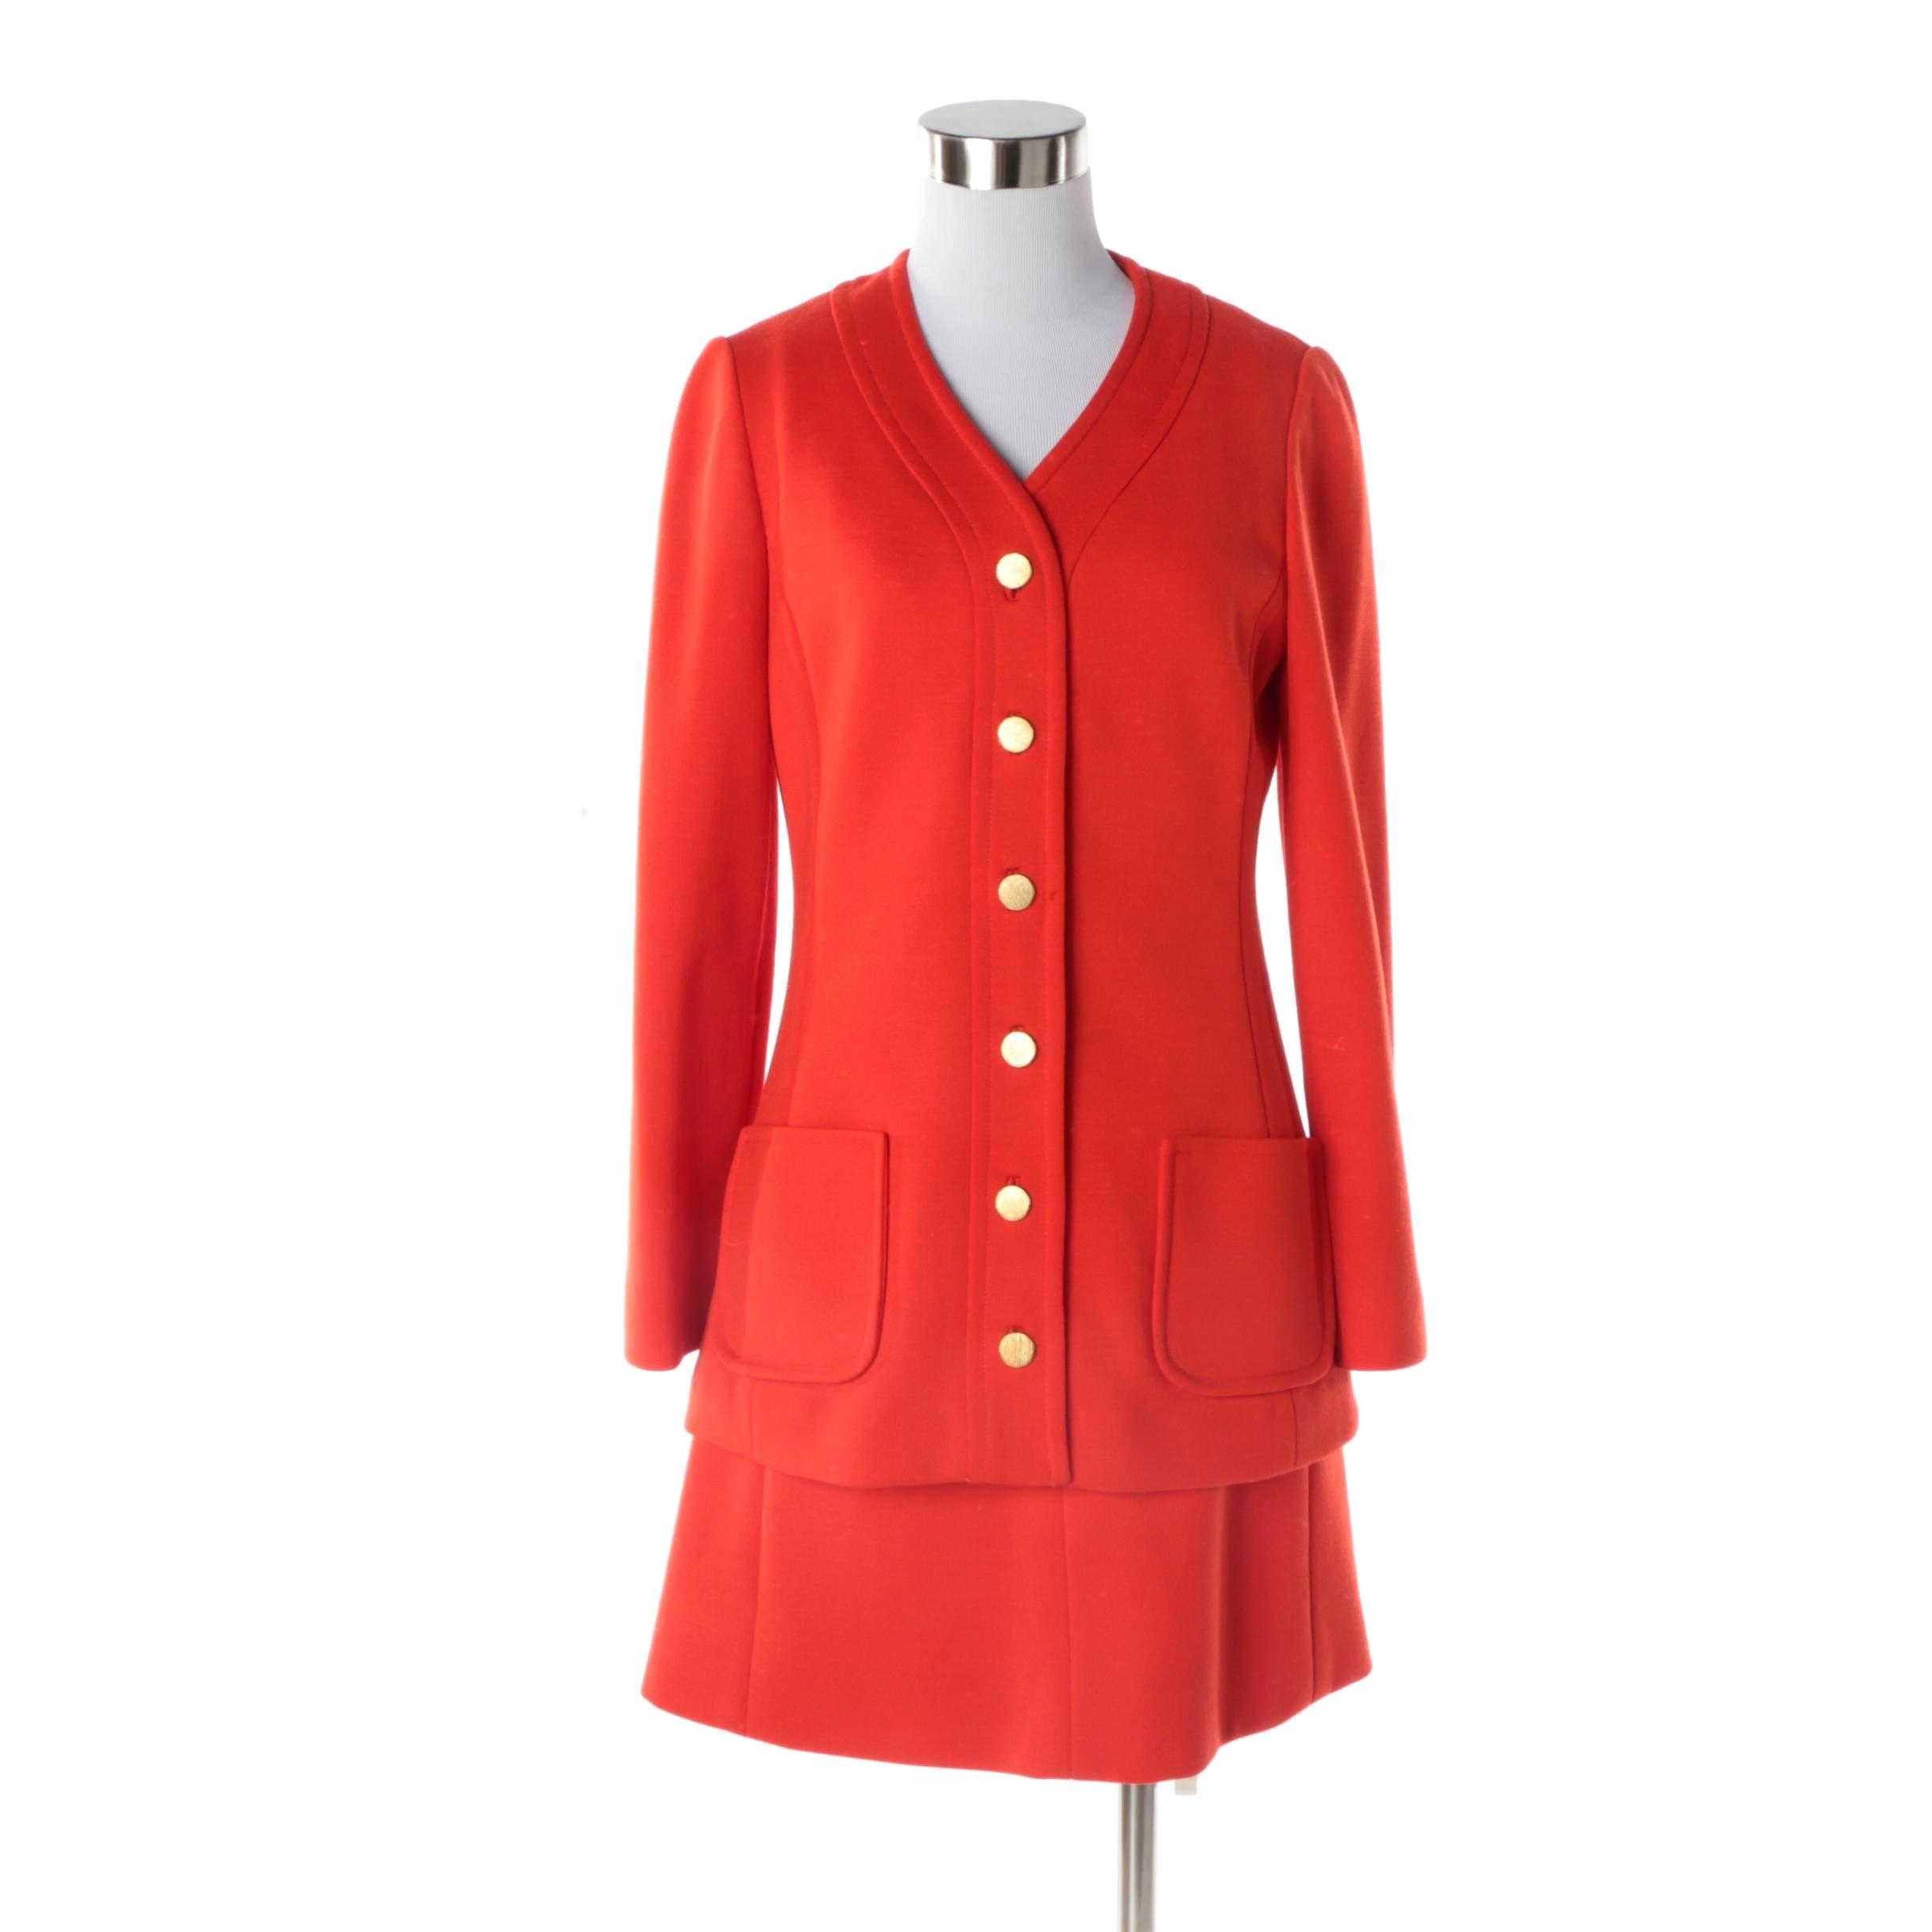 Women's Circa 1960s Vintage Jean Louis and Dalton Red Wool Dress Suit